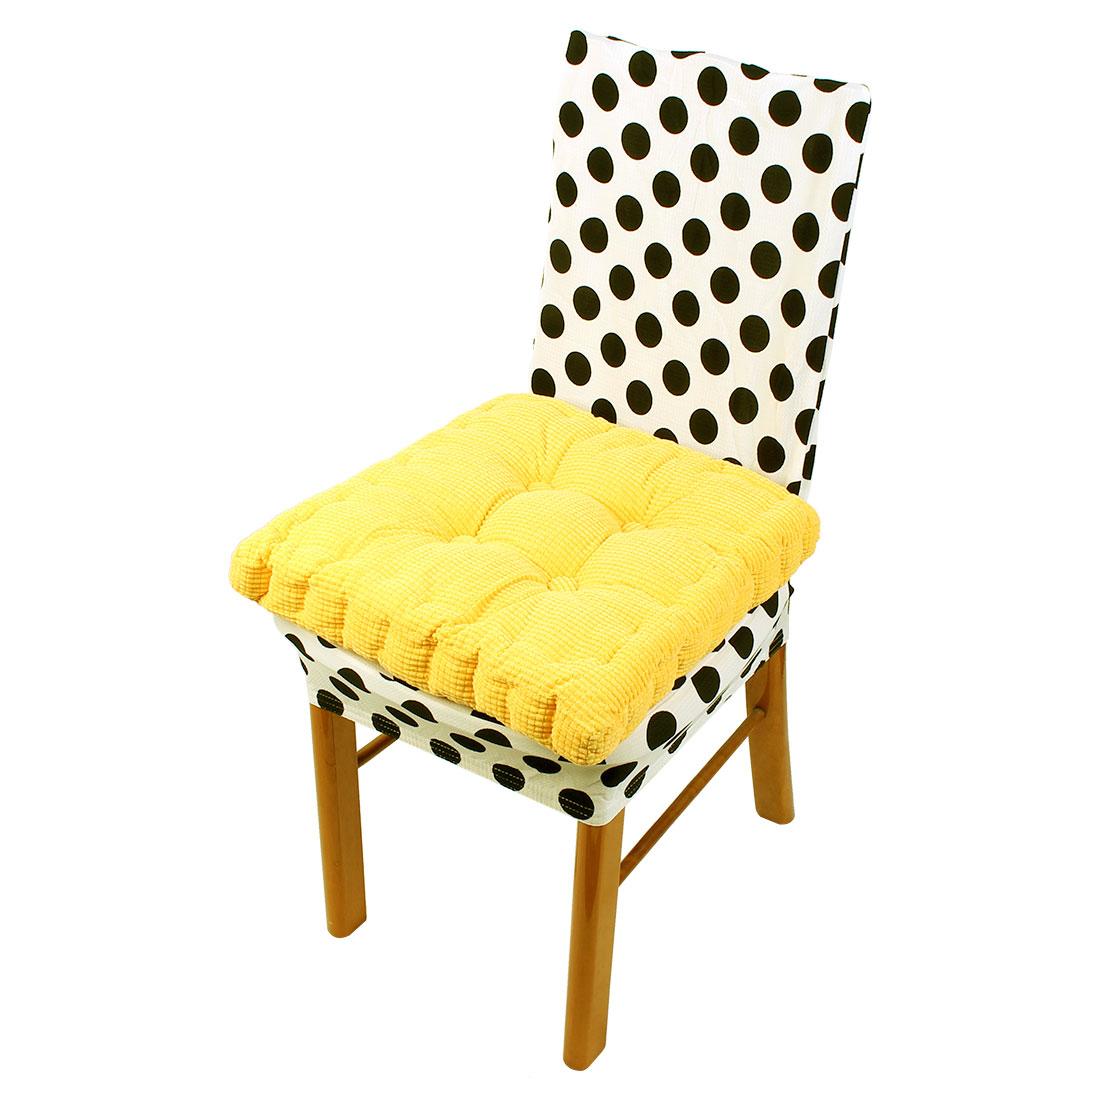 Home Office Corduroy Square Shaped Sofa Floor Chair Seat Cushion Pad Yellow 45 x 45cm